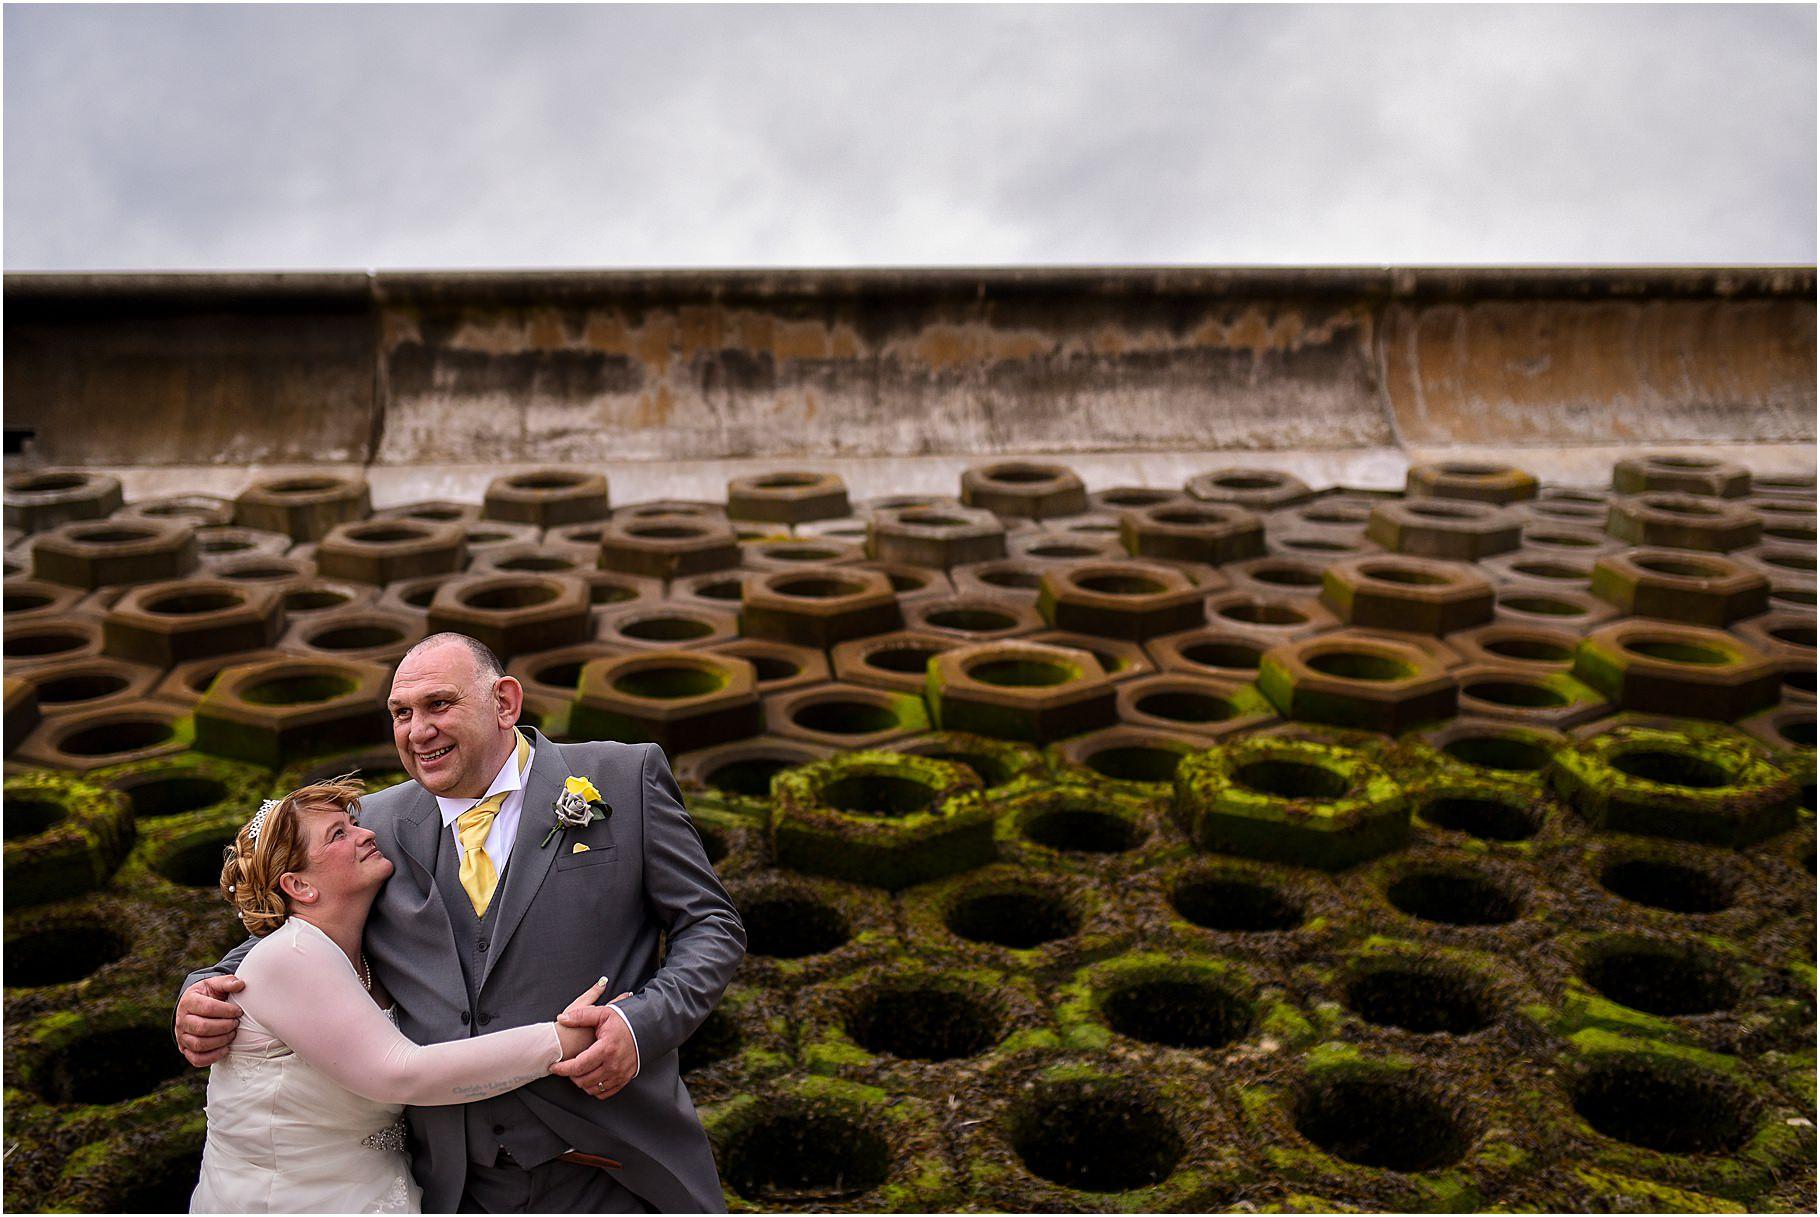 dan-wootton-photography-2017-weddings-168.jpg